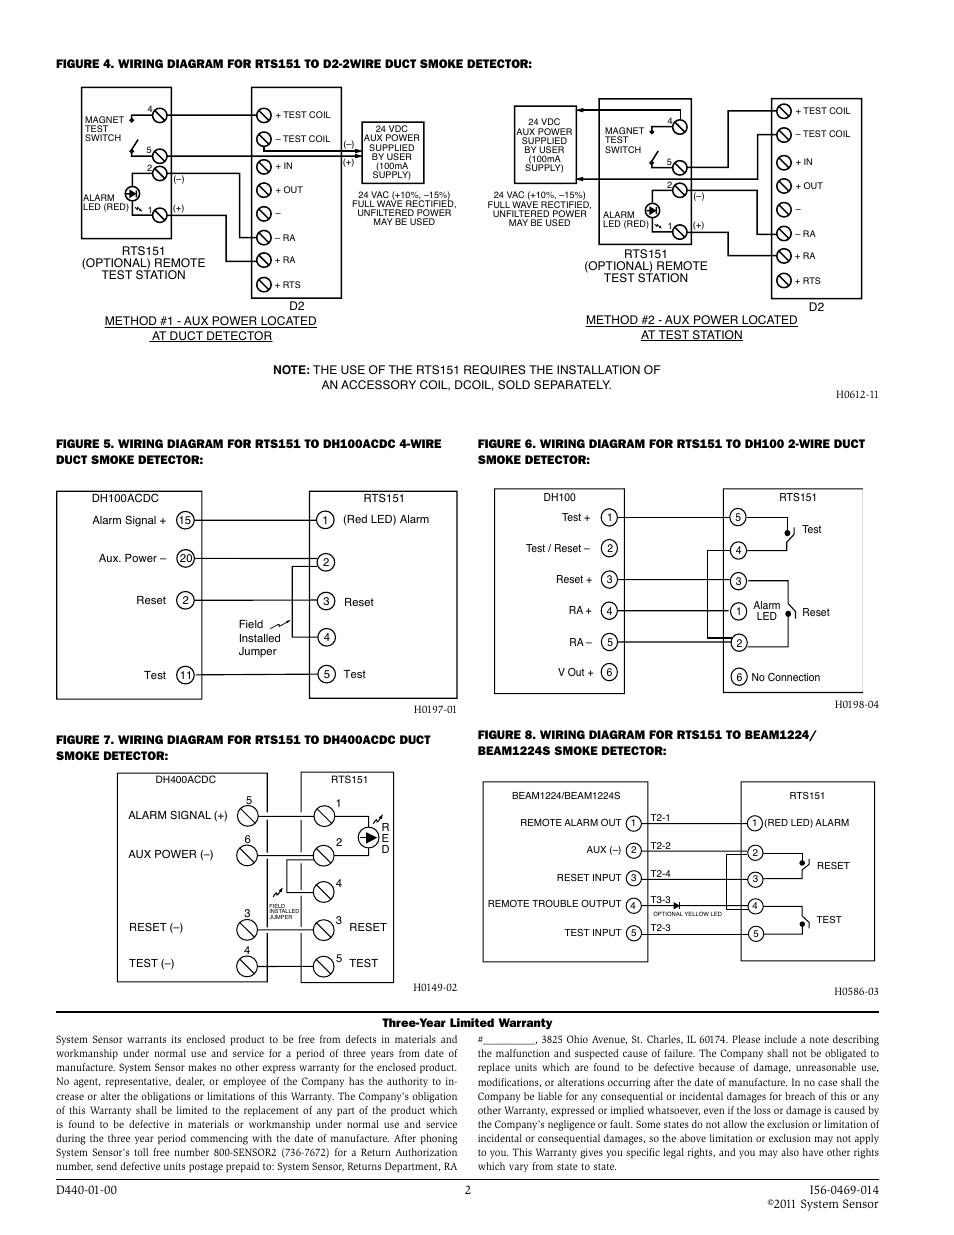 system sensor rts151 page2 system sensor beam detector 1224 wiring diagram wiring wiring system sensor beam detector 1224 wiring diagram at bayanpartner.co